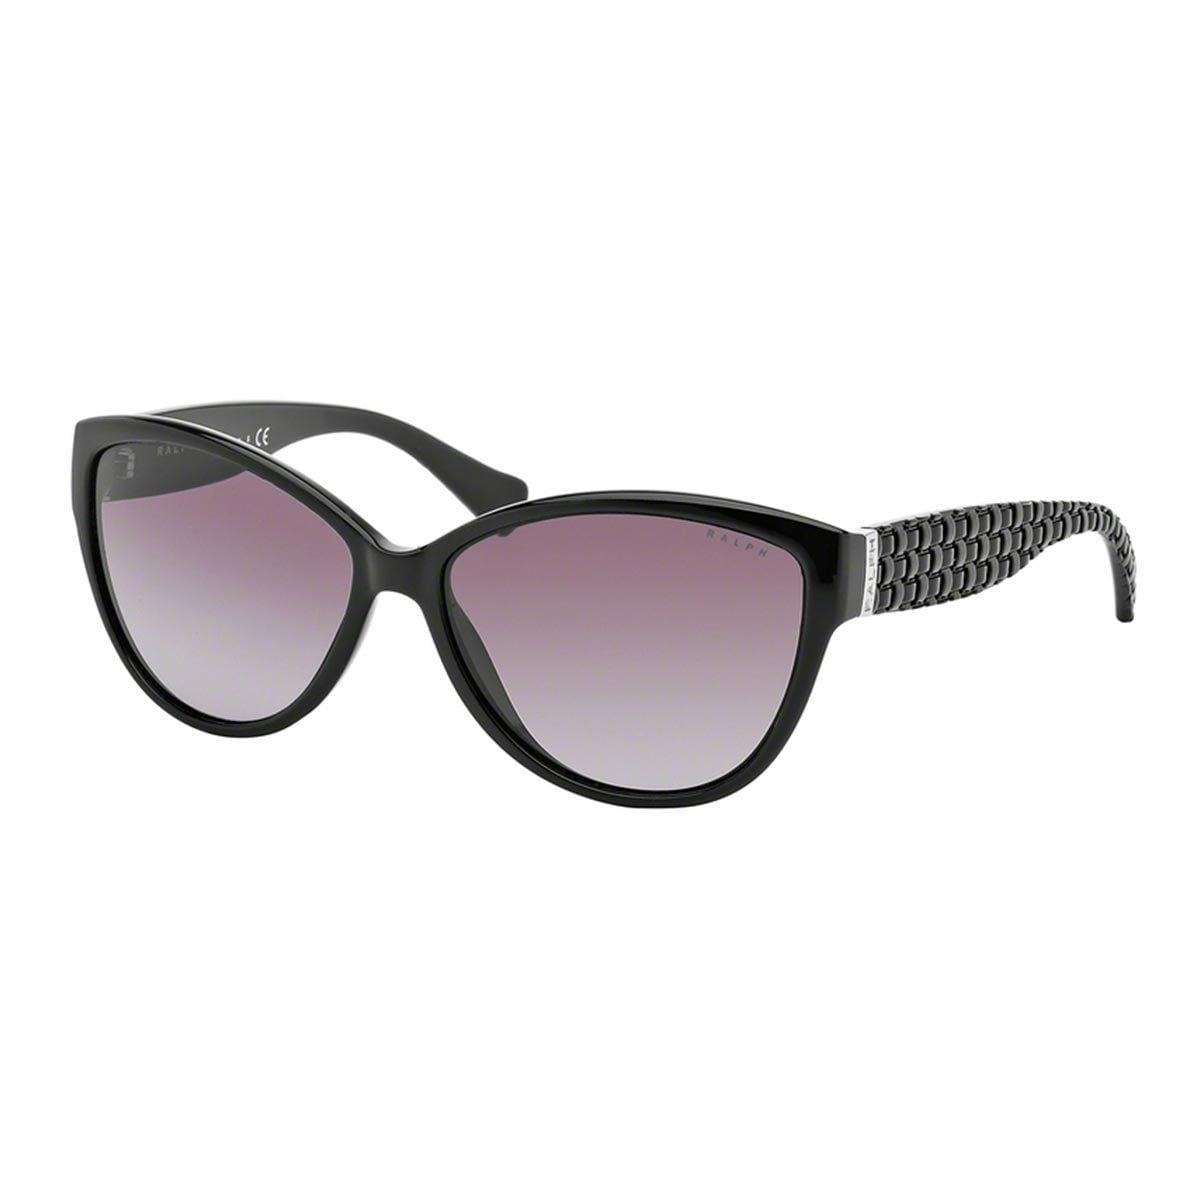 83f6f0e4c2b4 Shop Ralph by Ralph Lauren Women's RA5176 Black Plastic Cat Eye Sunglasses  - Free Shipping Today - Overstock - 10857524